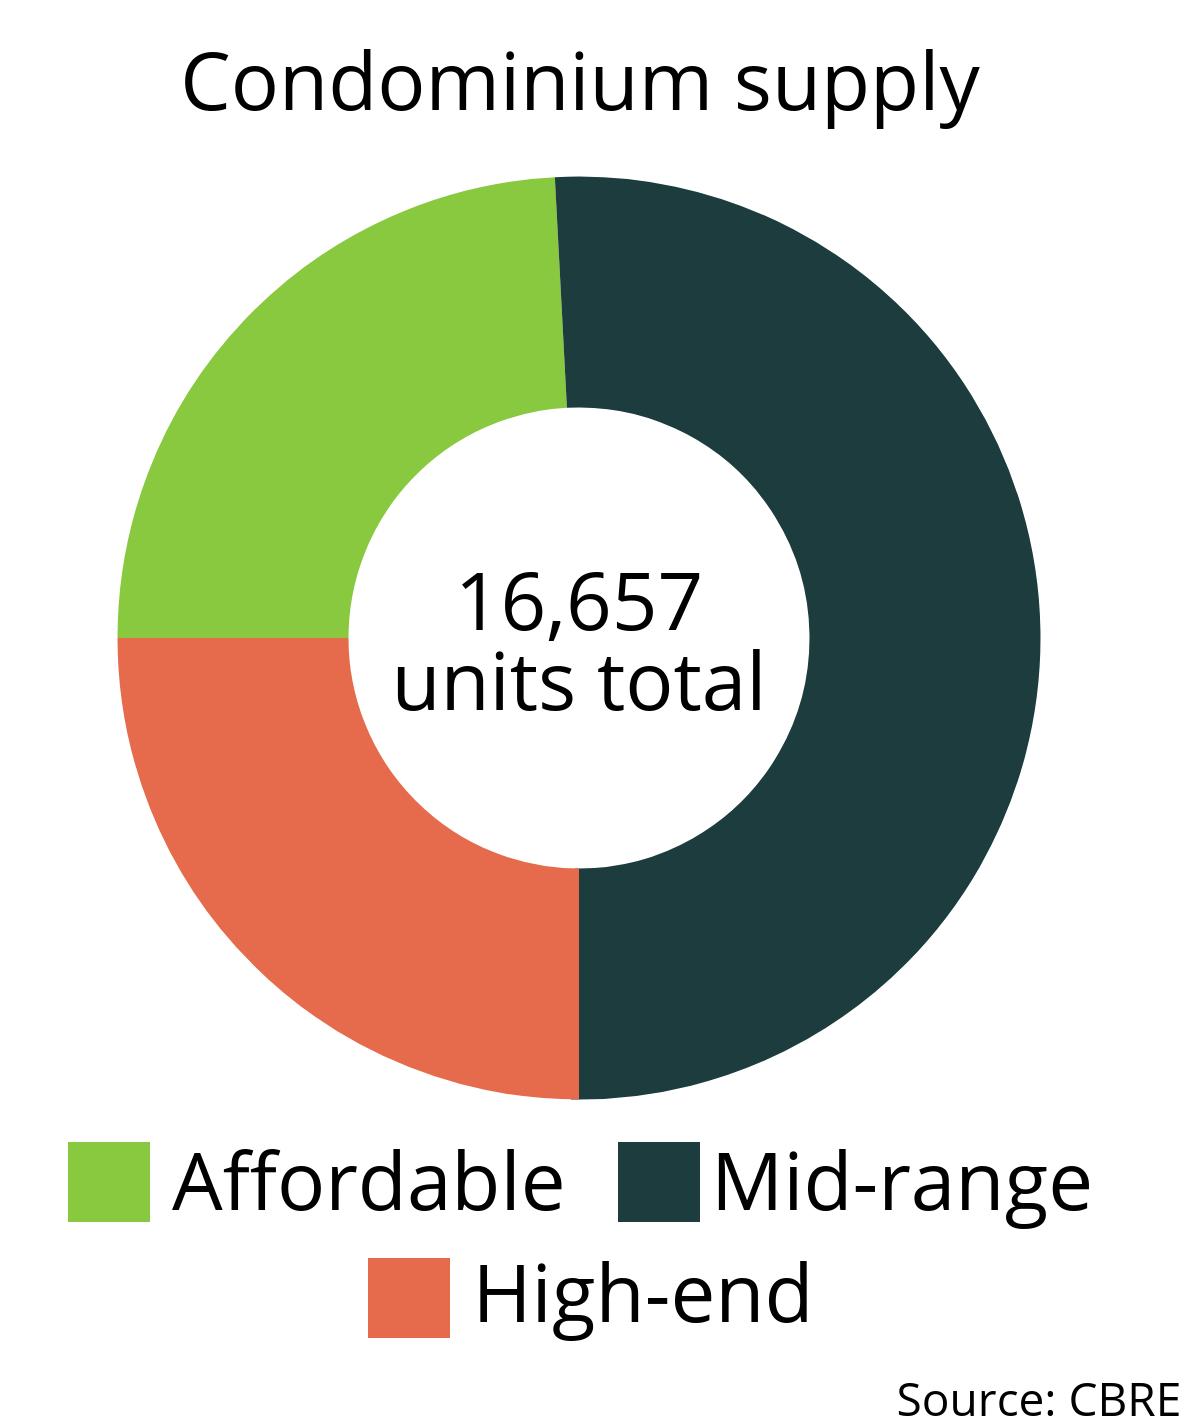 Graphic shows price segments of condos in phnom penh